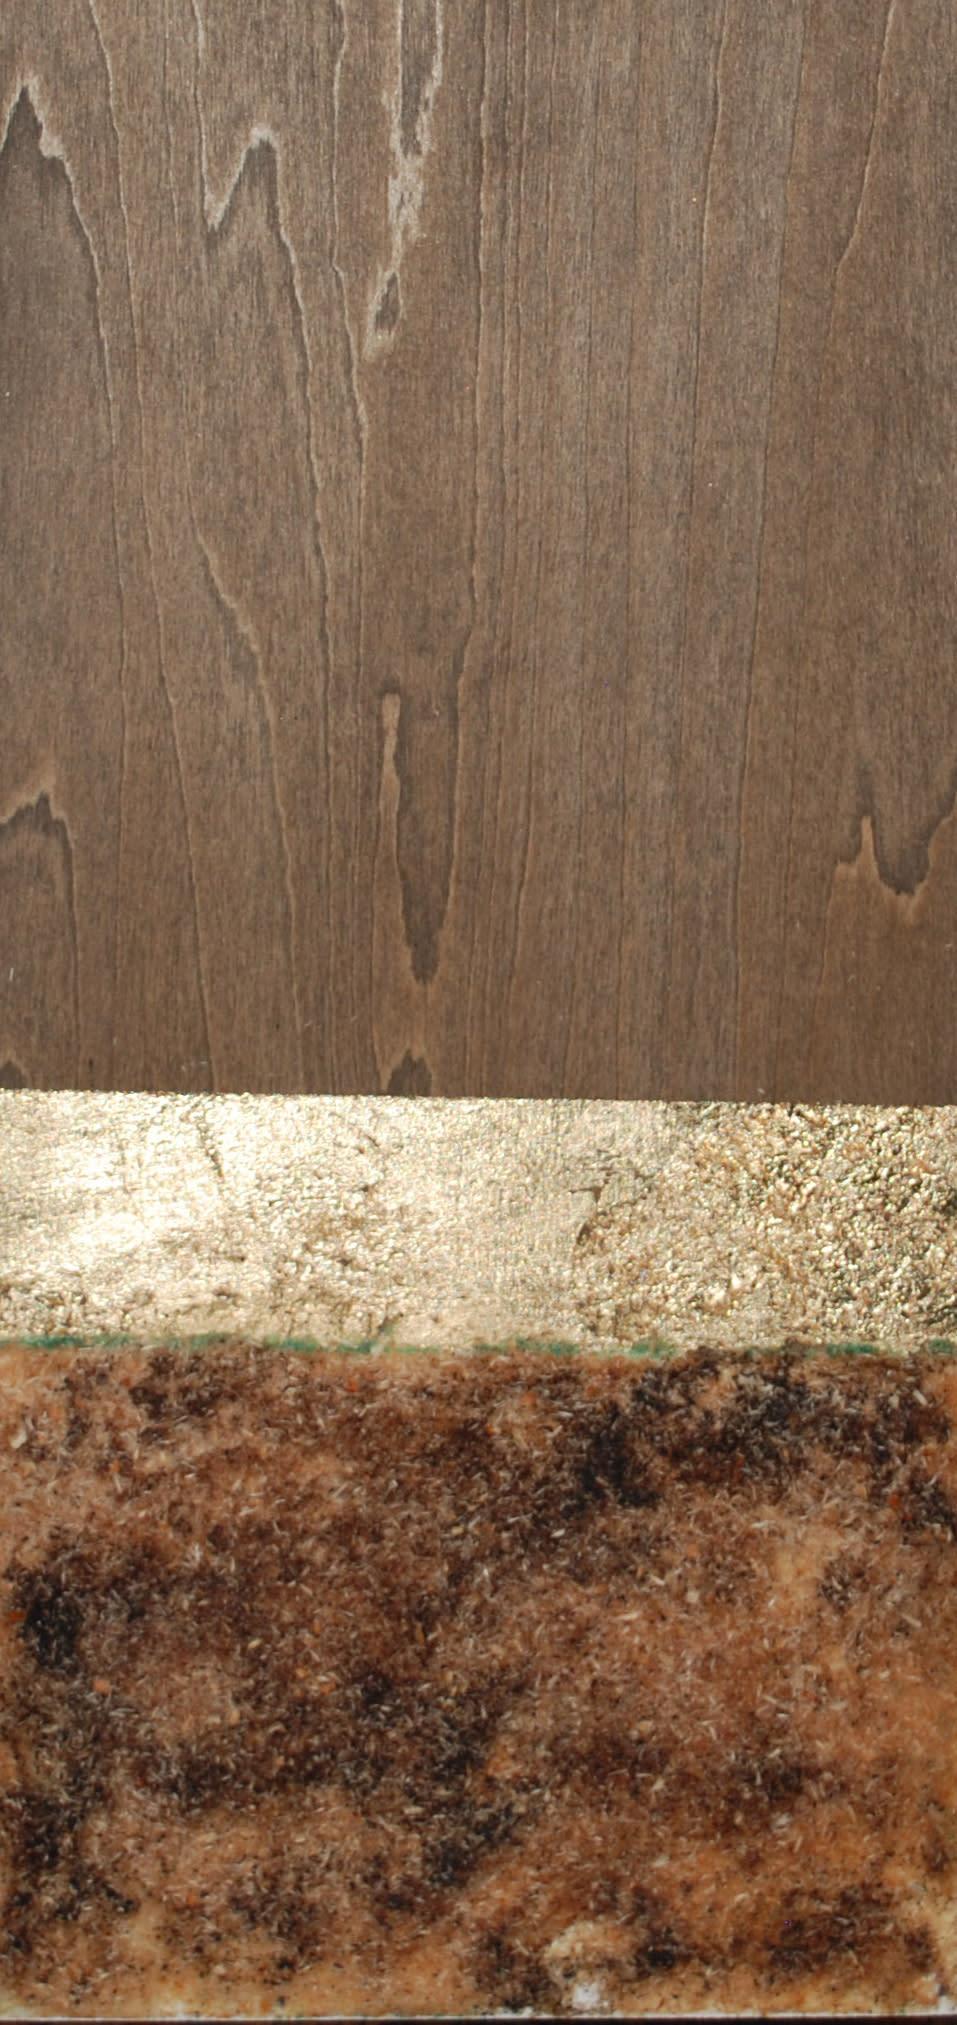 Wood grain sawdust nqdfop